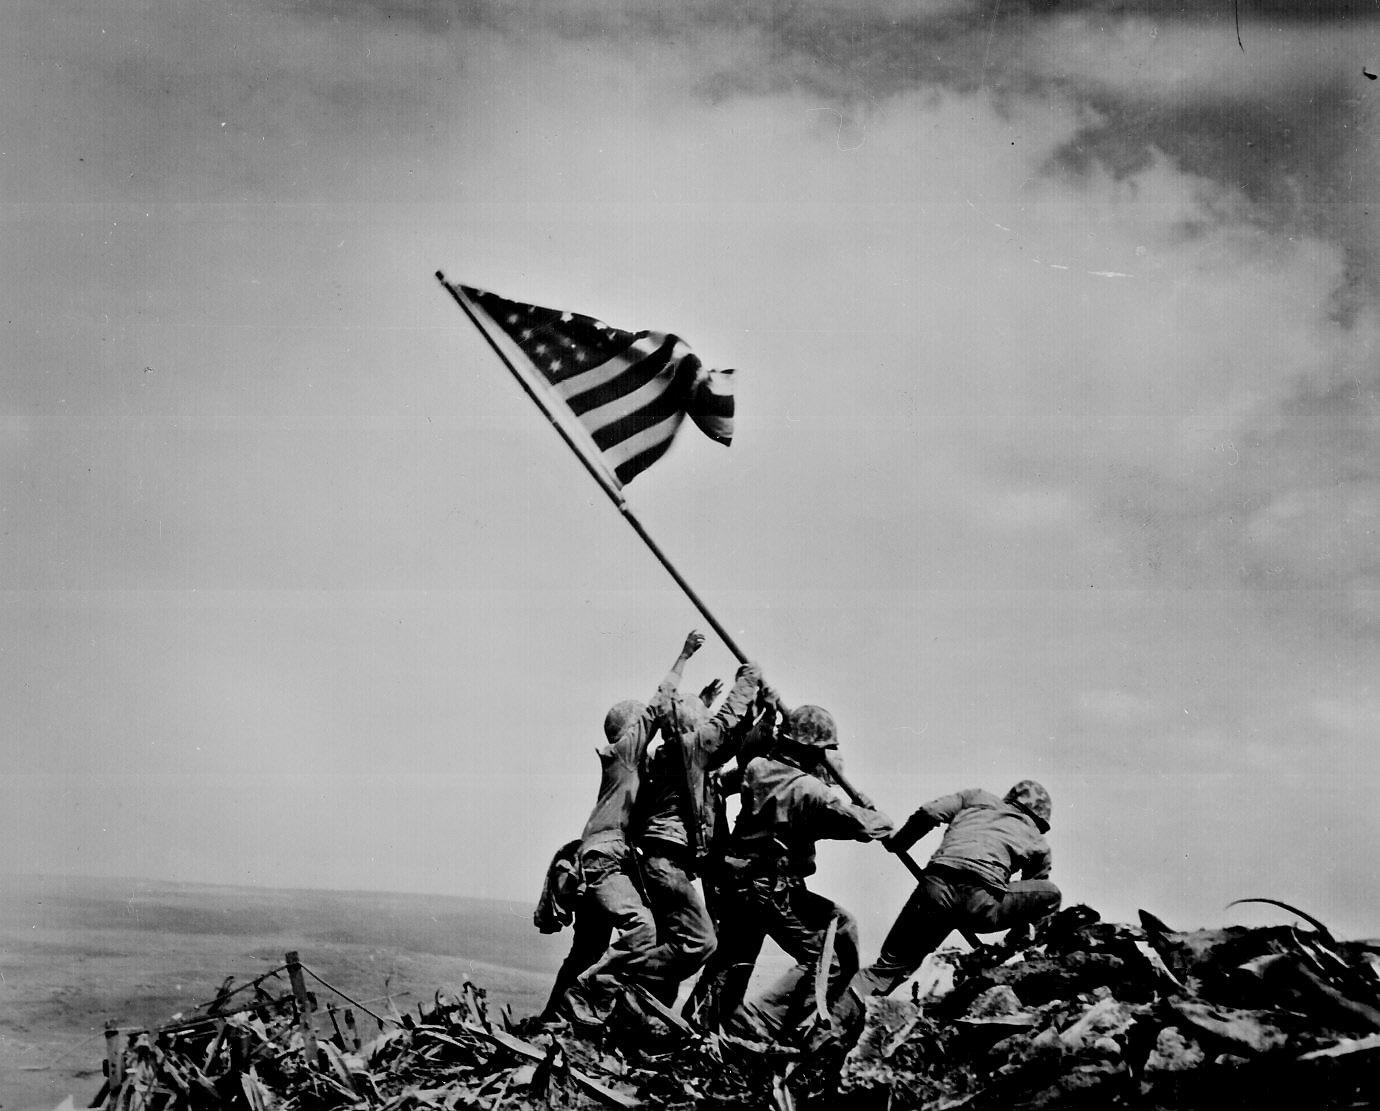 Celebration: Spirit of 45 - End of WW II - August 14